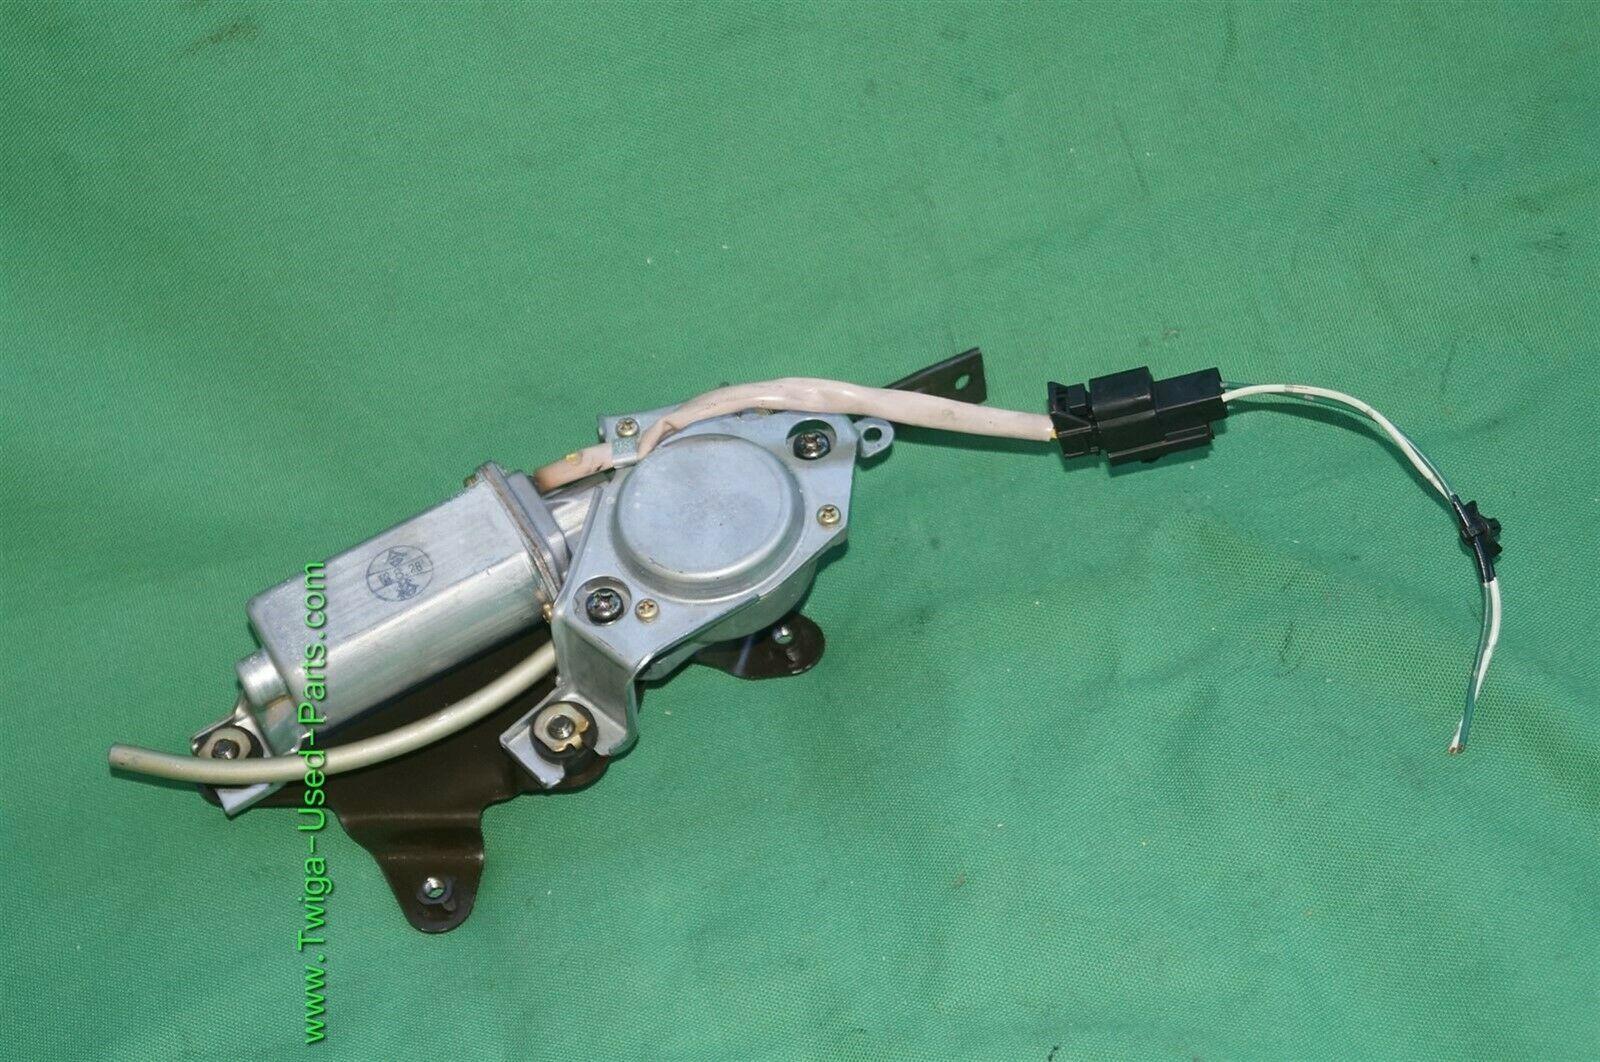 04-08 Nissan 350Z Roadster Convertible Tonneau Cover Lock Release Motor